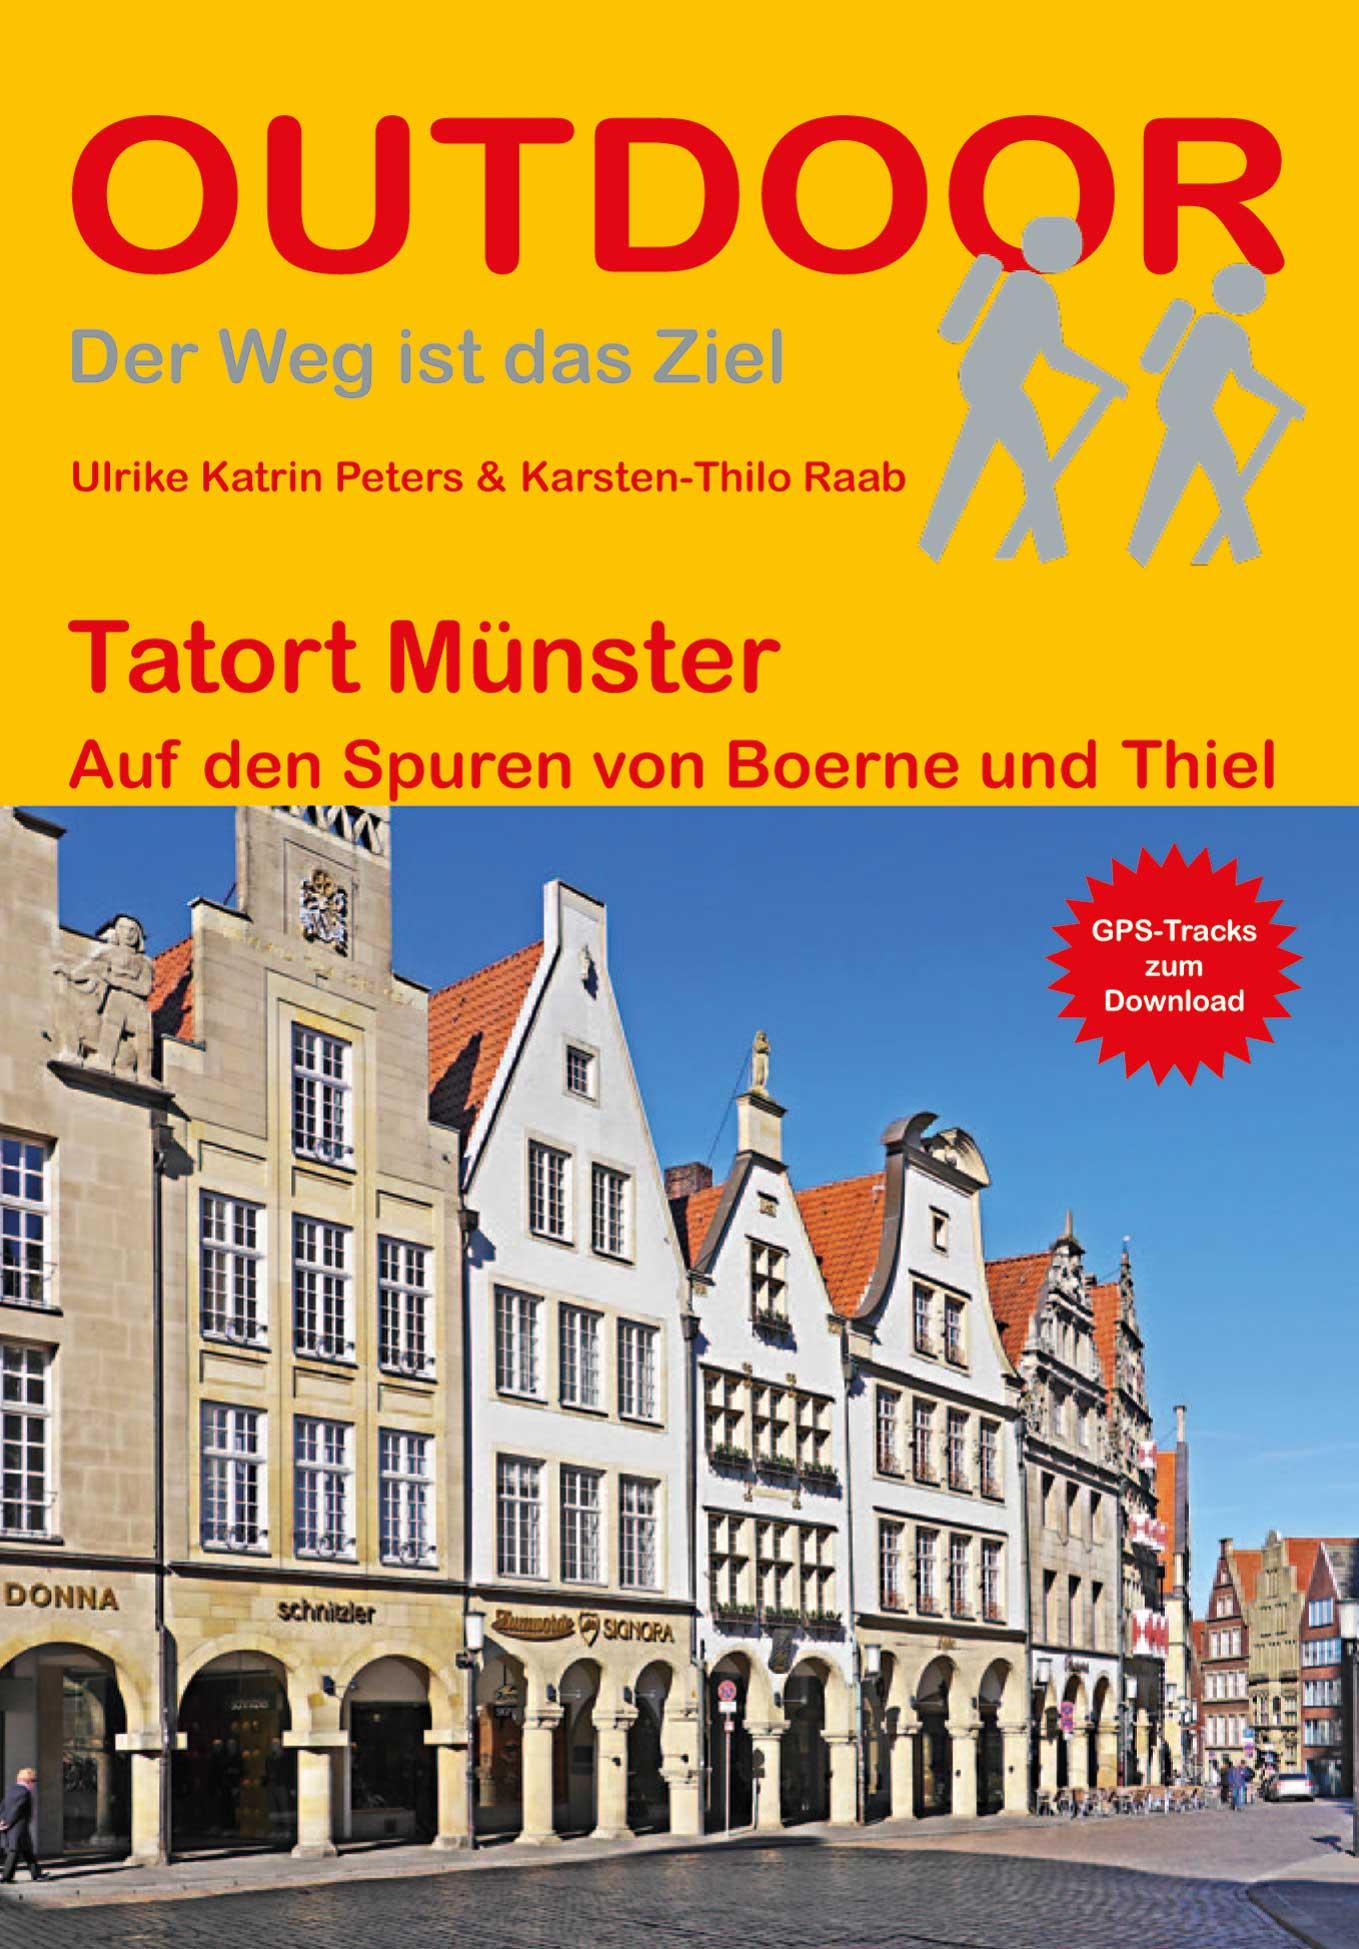 NEU-Tatort-Muenster-Ulrike-Katrin-Peters-865860